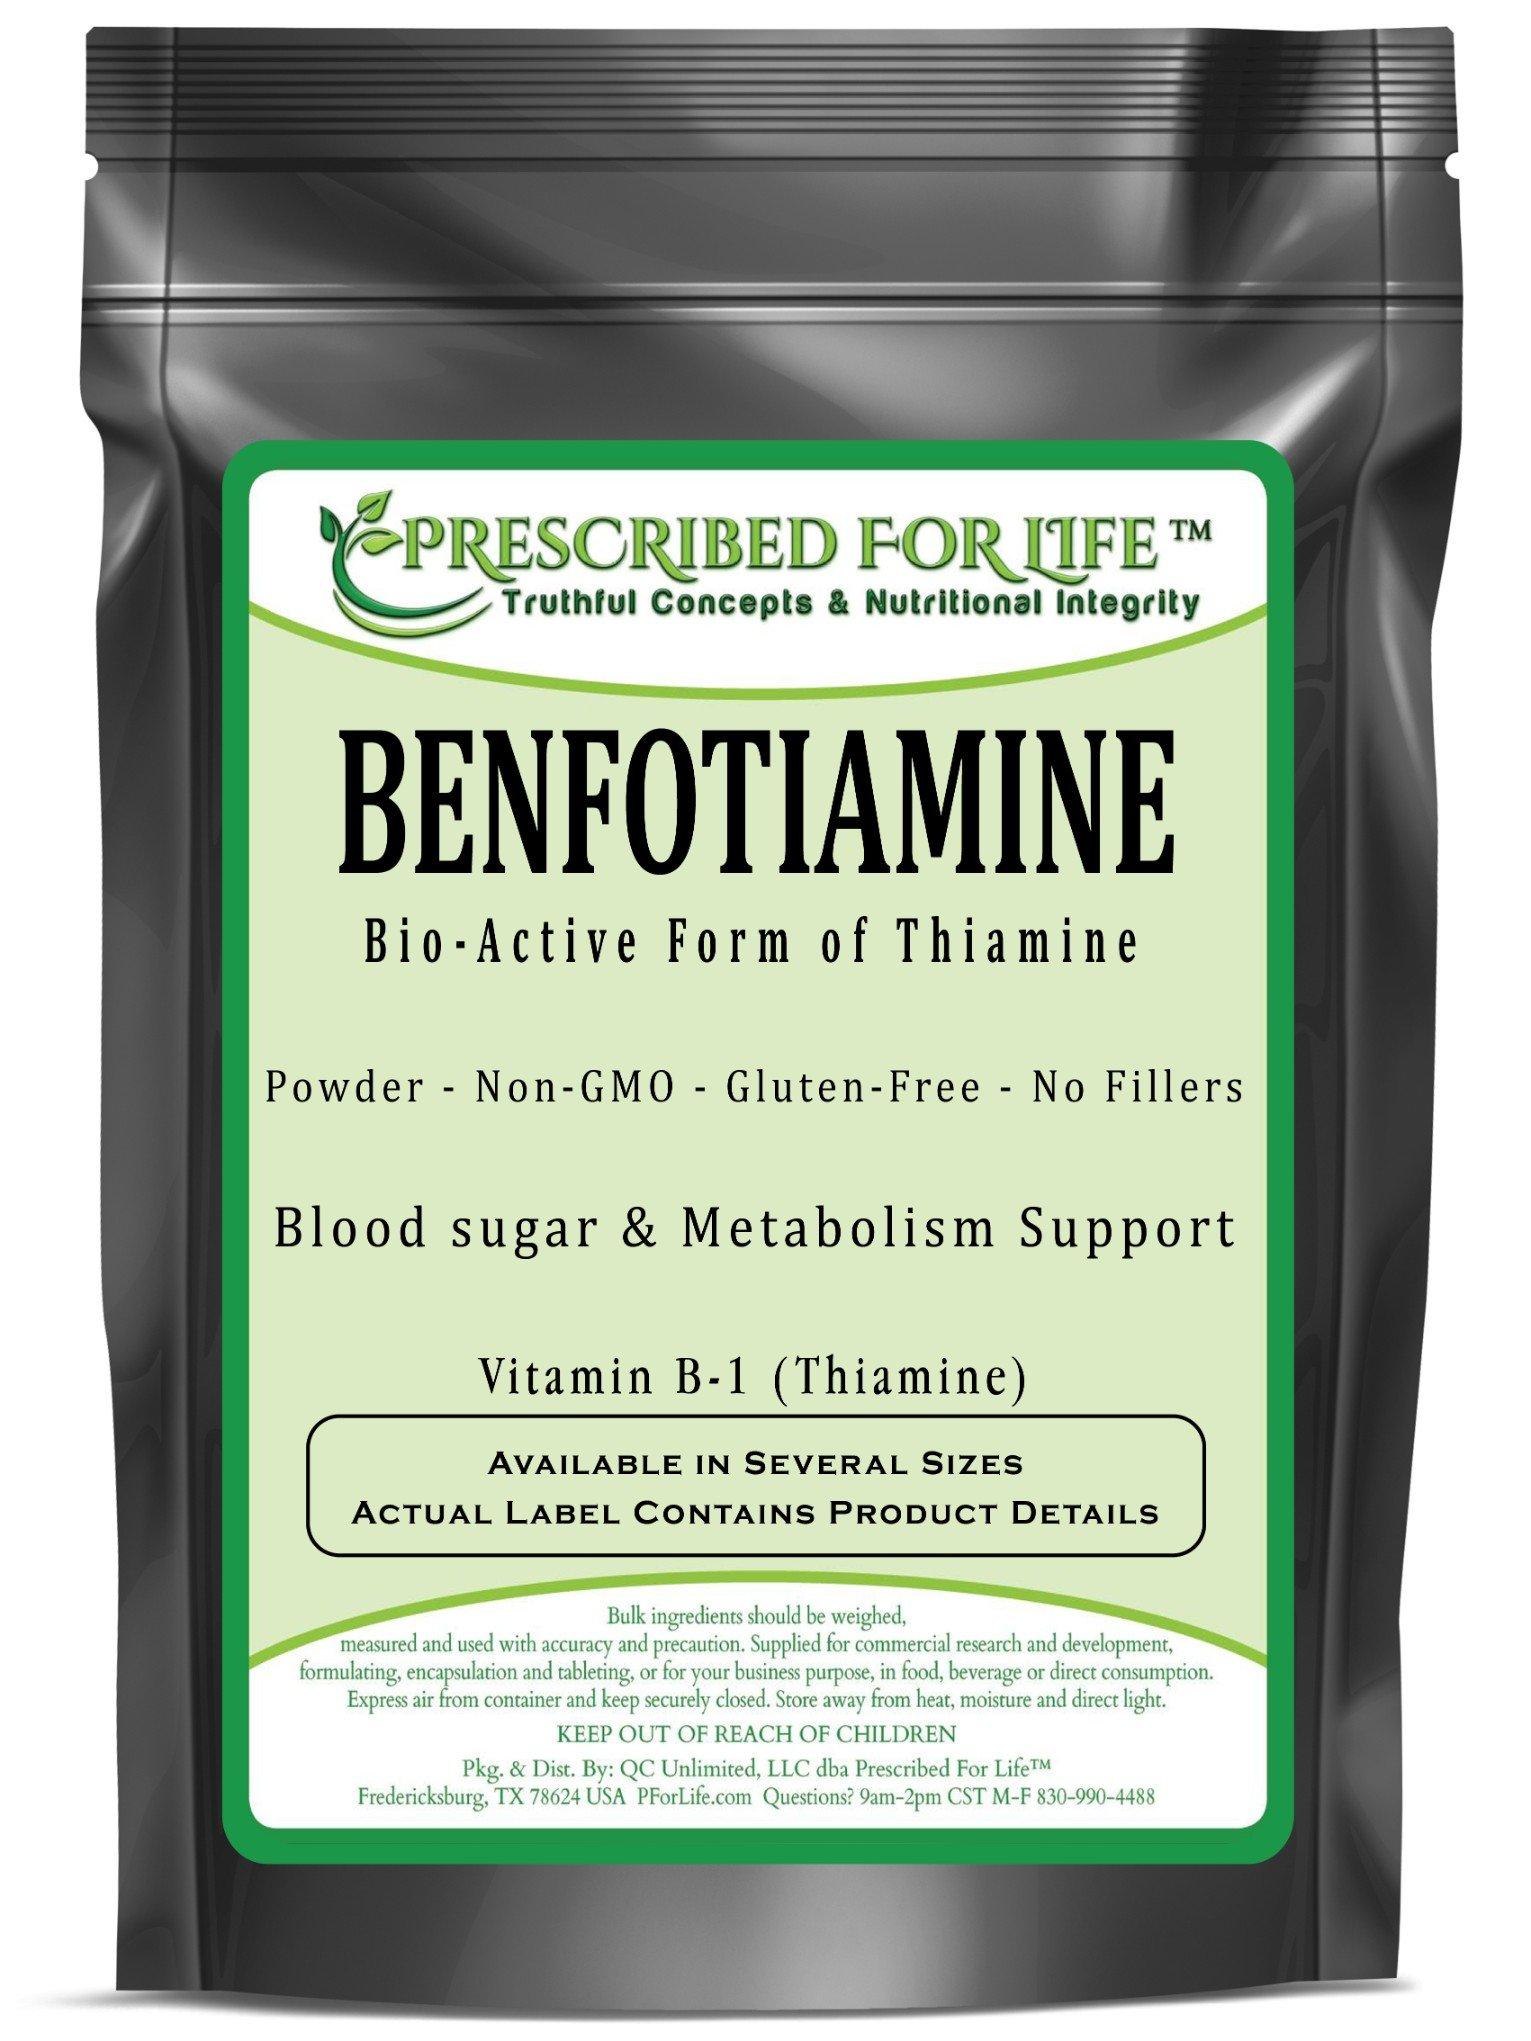 Benfotiamine - BioActive Form of Thiamine - Vitamin B-1 Powder, 4 oz